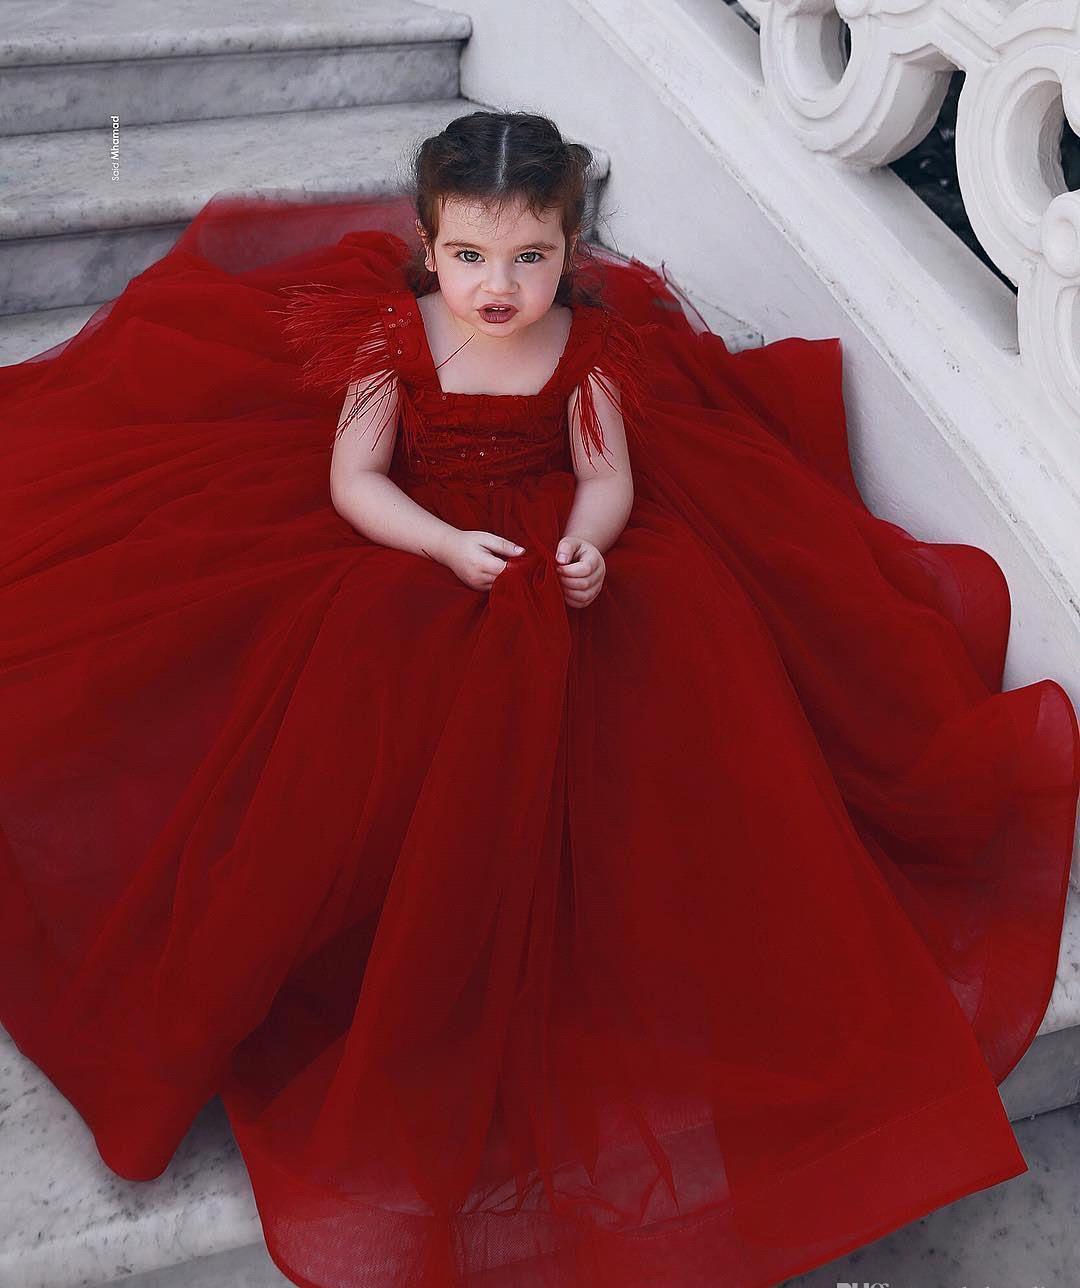 fd924c3da72d8 2019 Cheap Lovely For Country Garden Dark Red Flower Girl Dresses Daughter  Toddler Pretty Kids Pageant Formal First Holy Communion Gown Silk Flower  Girl ...